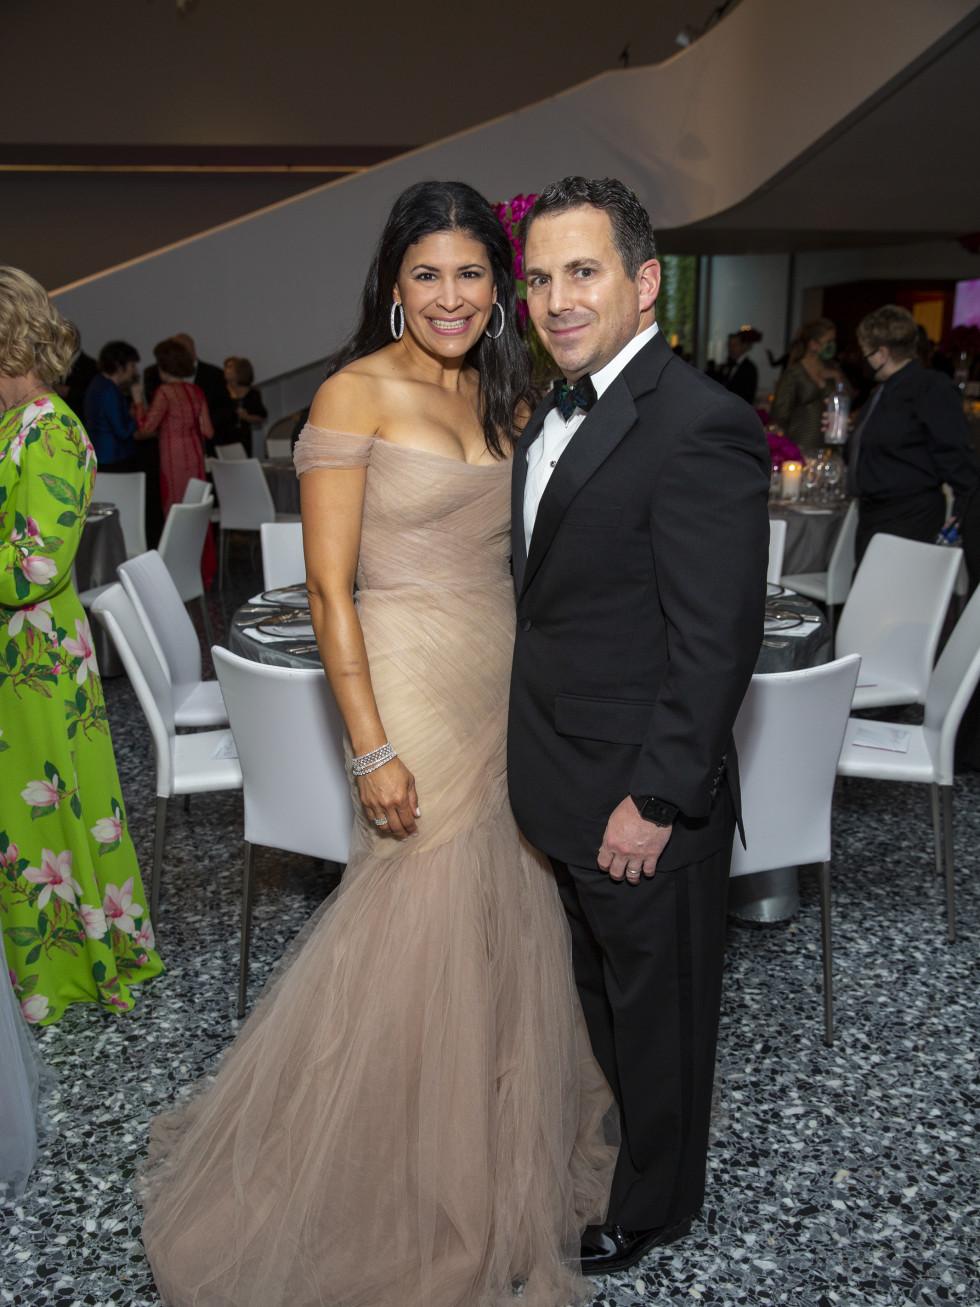 MFAH Grand Gala Ball 2021 Kristy and Chris Bradshaw